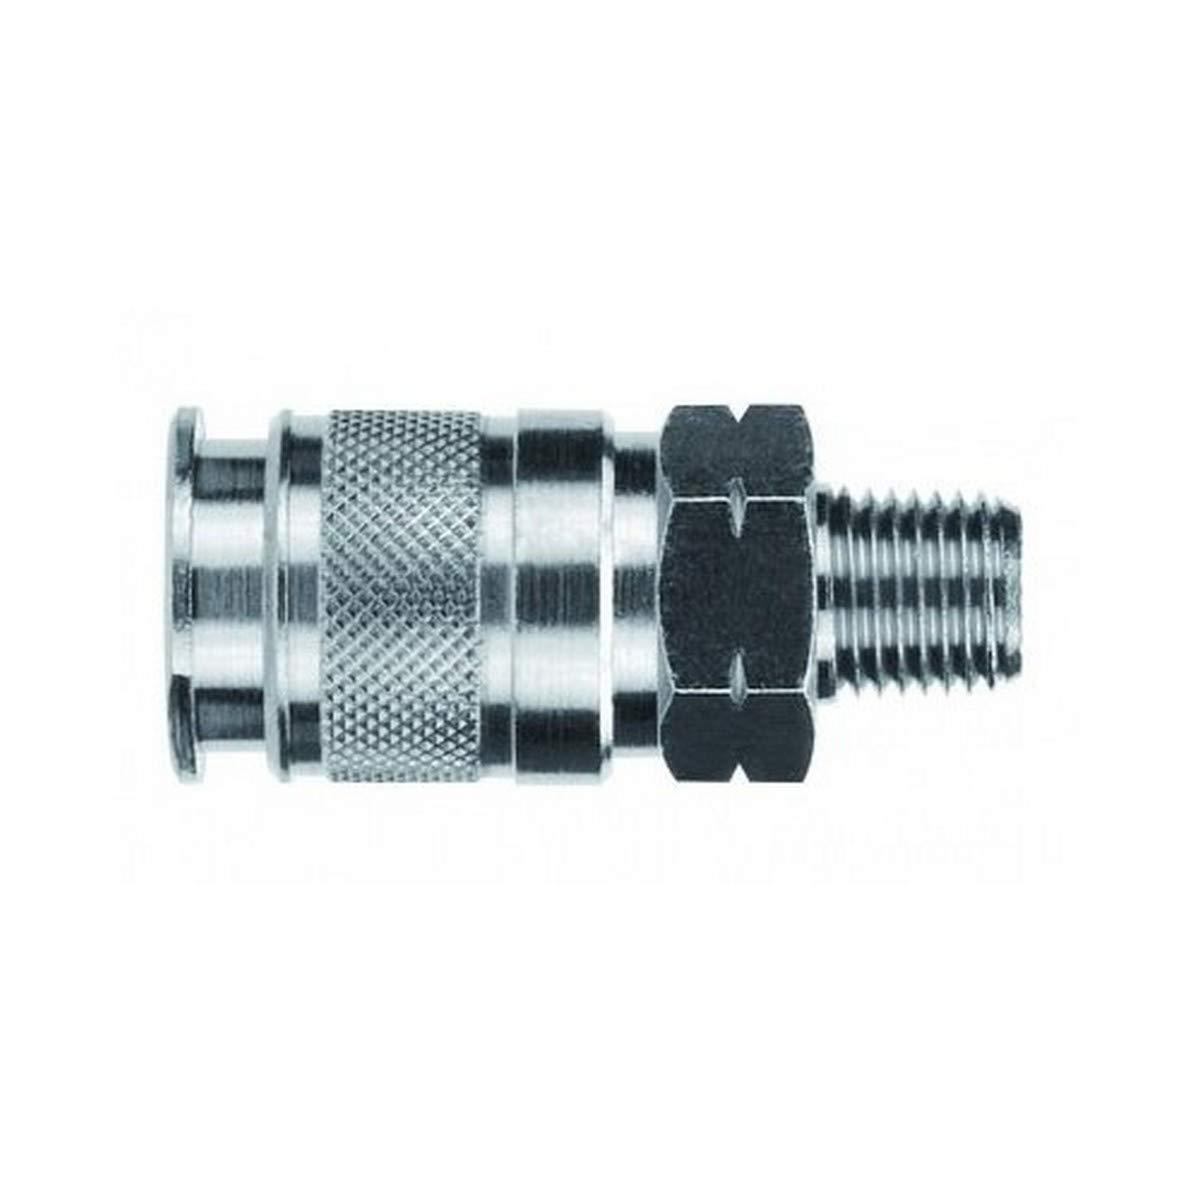 Nickel Plated Brass AIGNEP USA 80111-02 1//4 AC Mini Coupler x 1//8 Male NPTF Thread